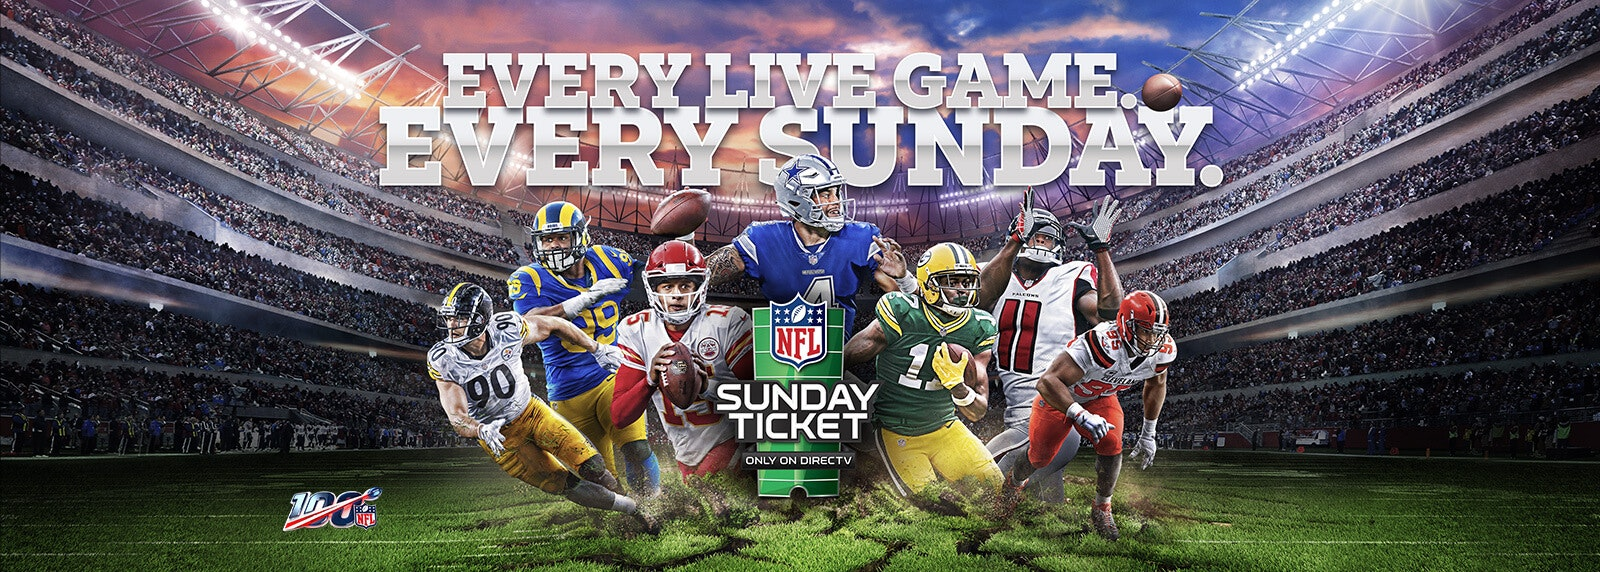 watch cardinals vs giants live stream nfl sunday ticket